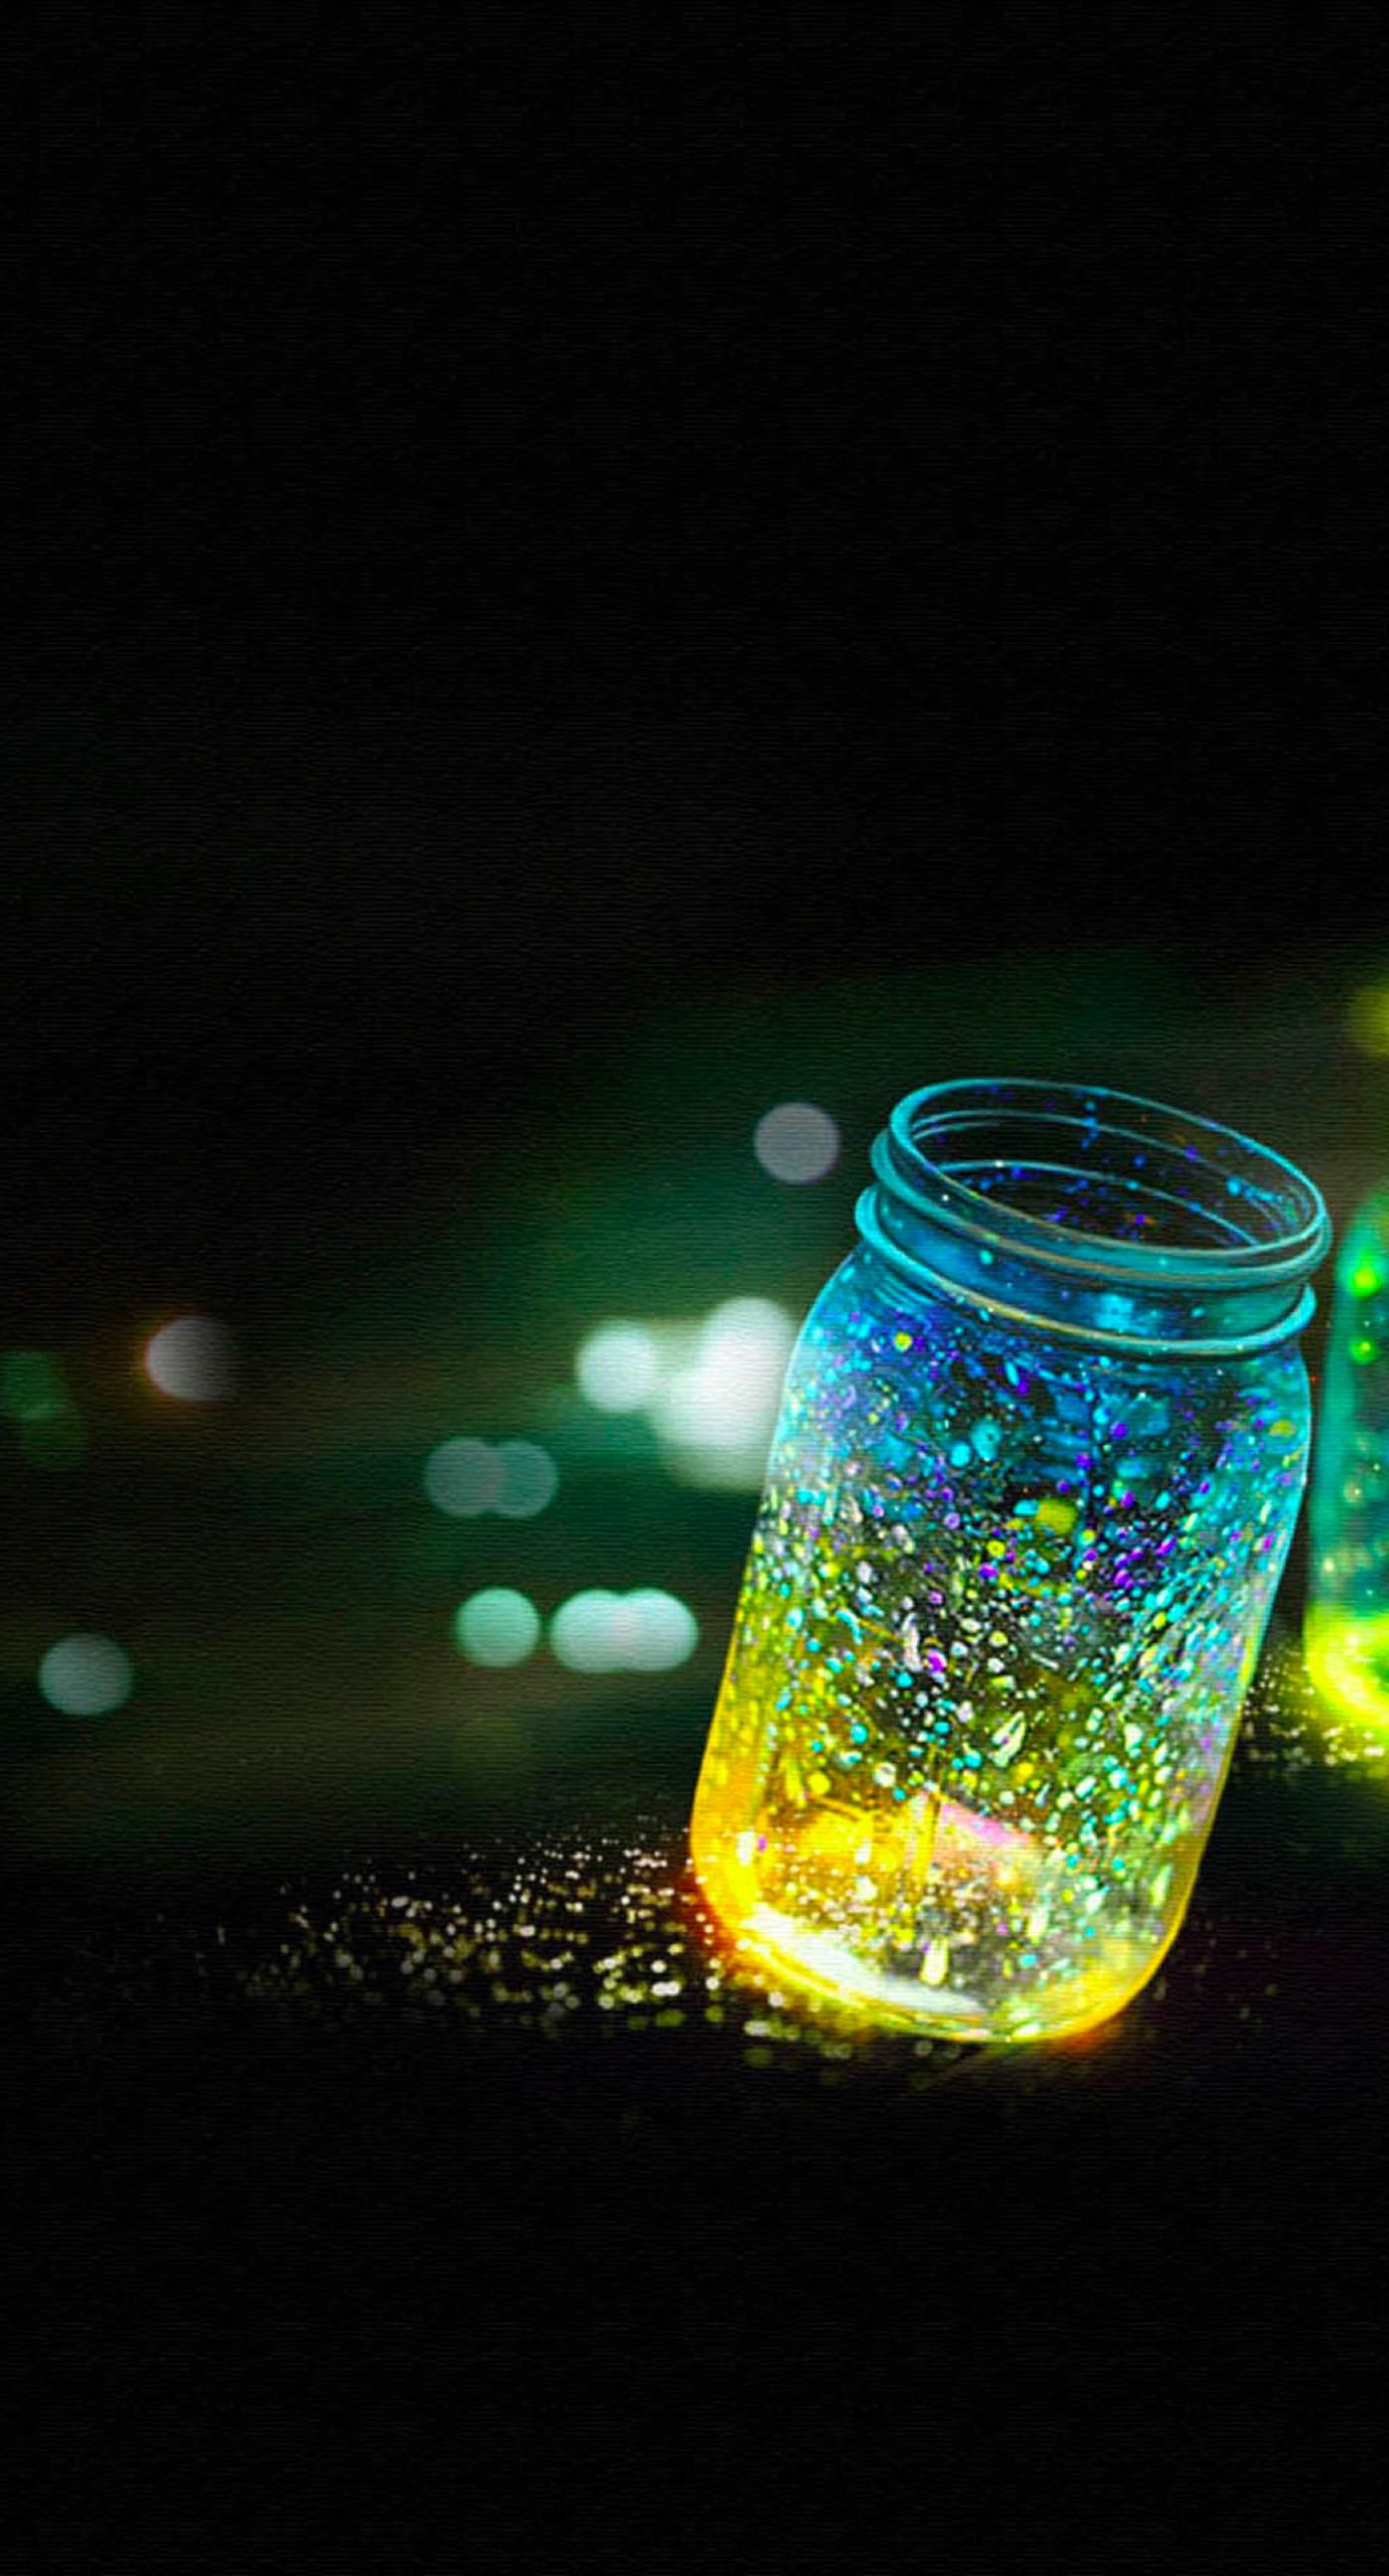 Cool Colorful Bottle Wallpaper Sc Iphone7plus